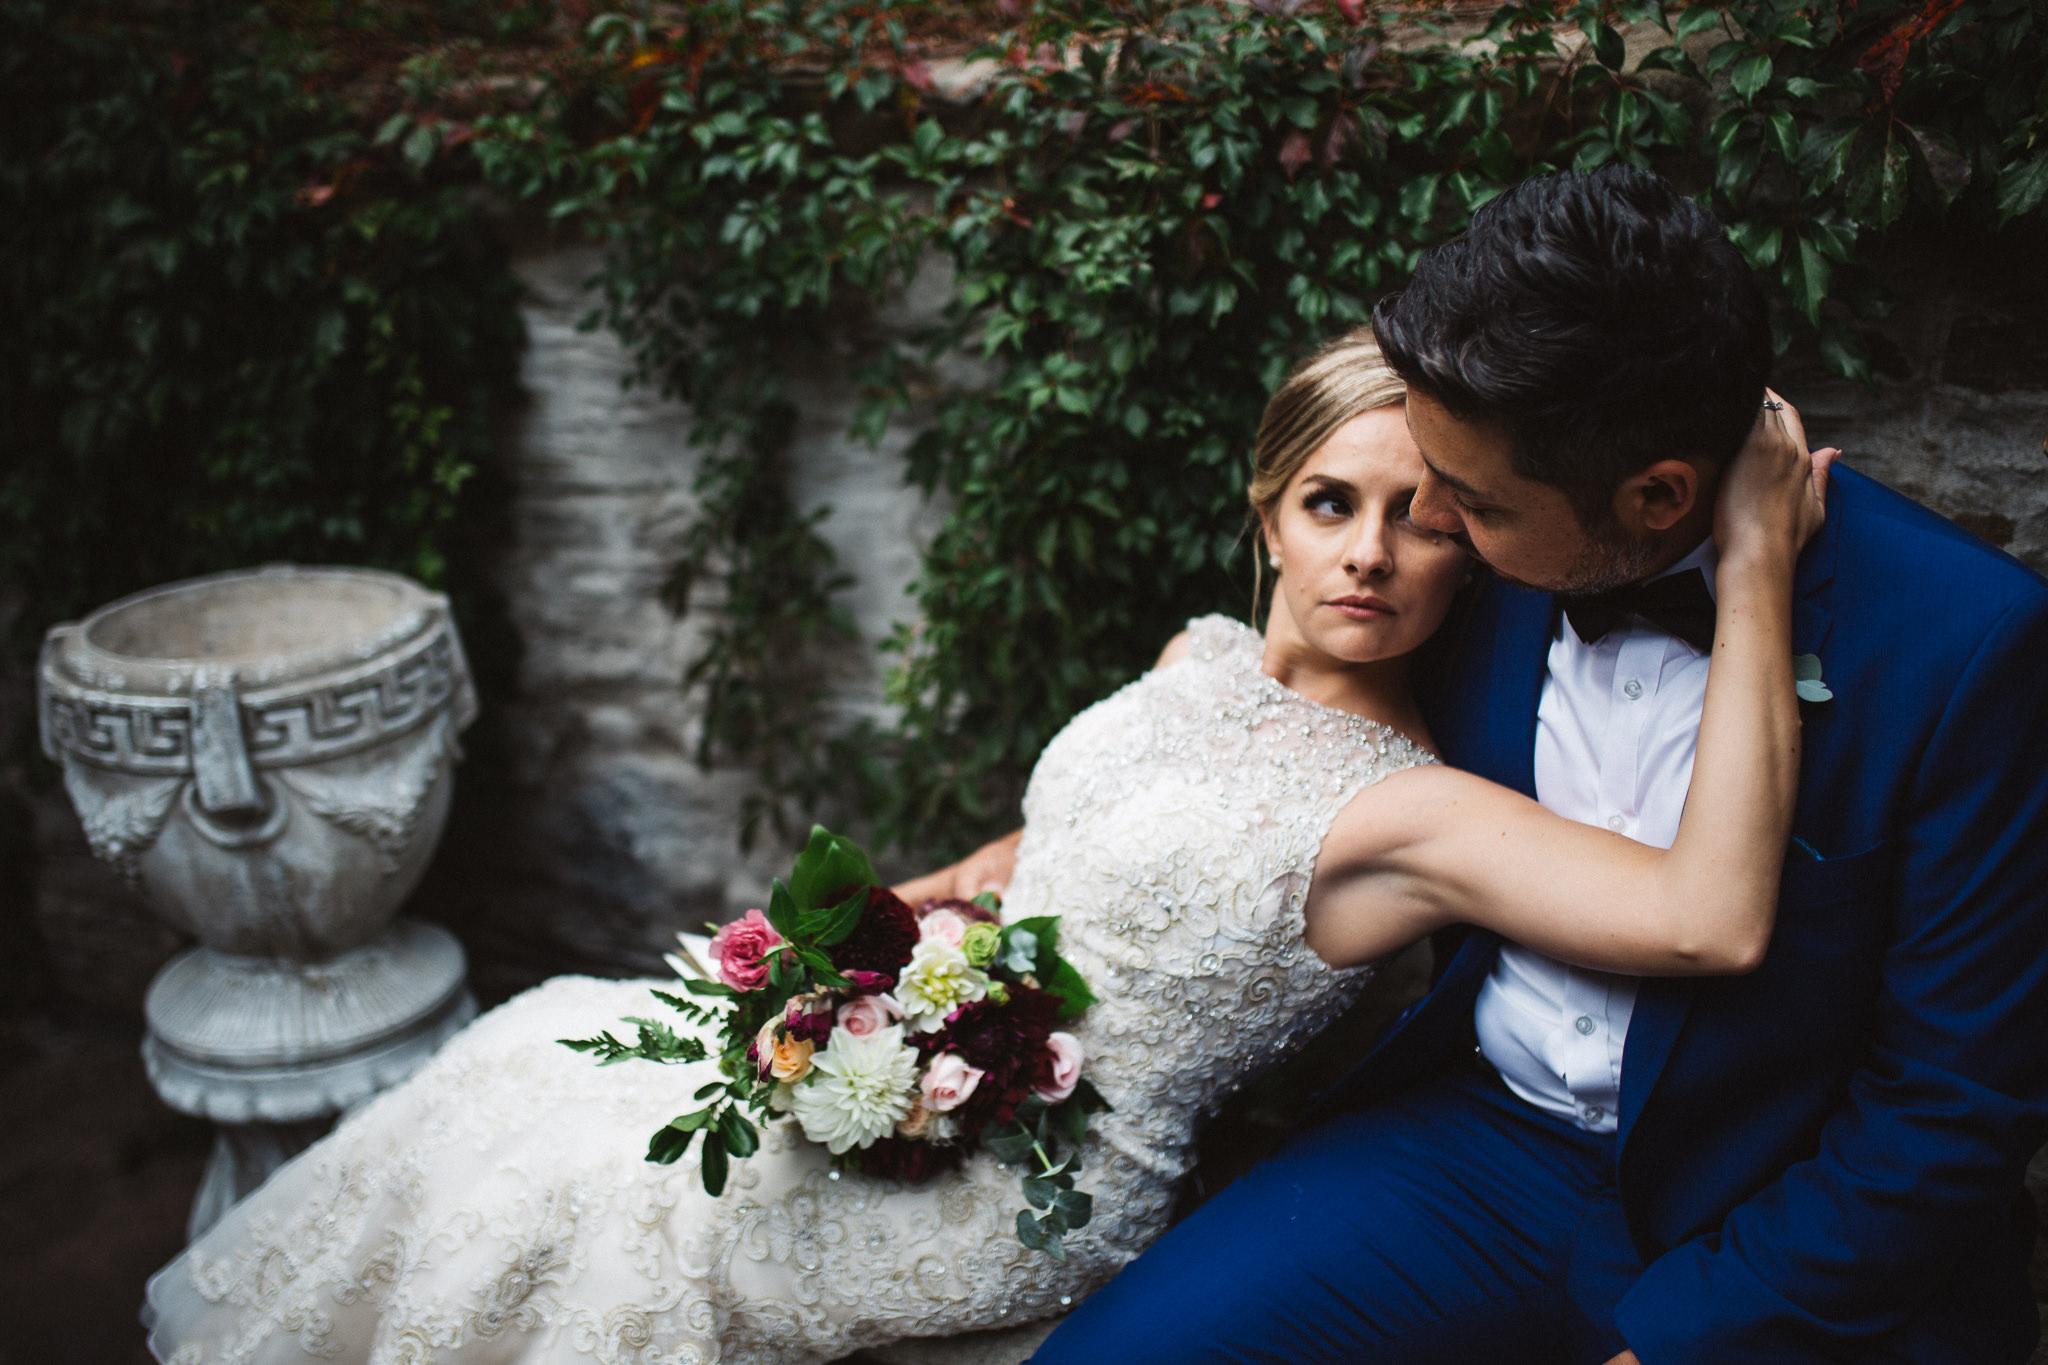 Toronto summer wedding at Old Mill Inn by Max Wong Photo (40)